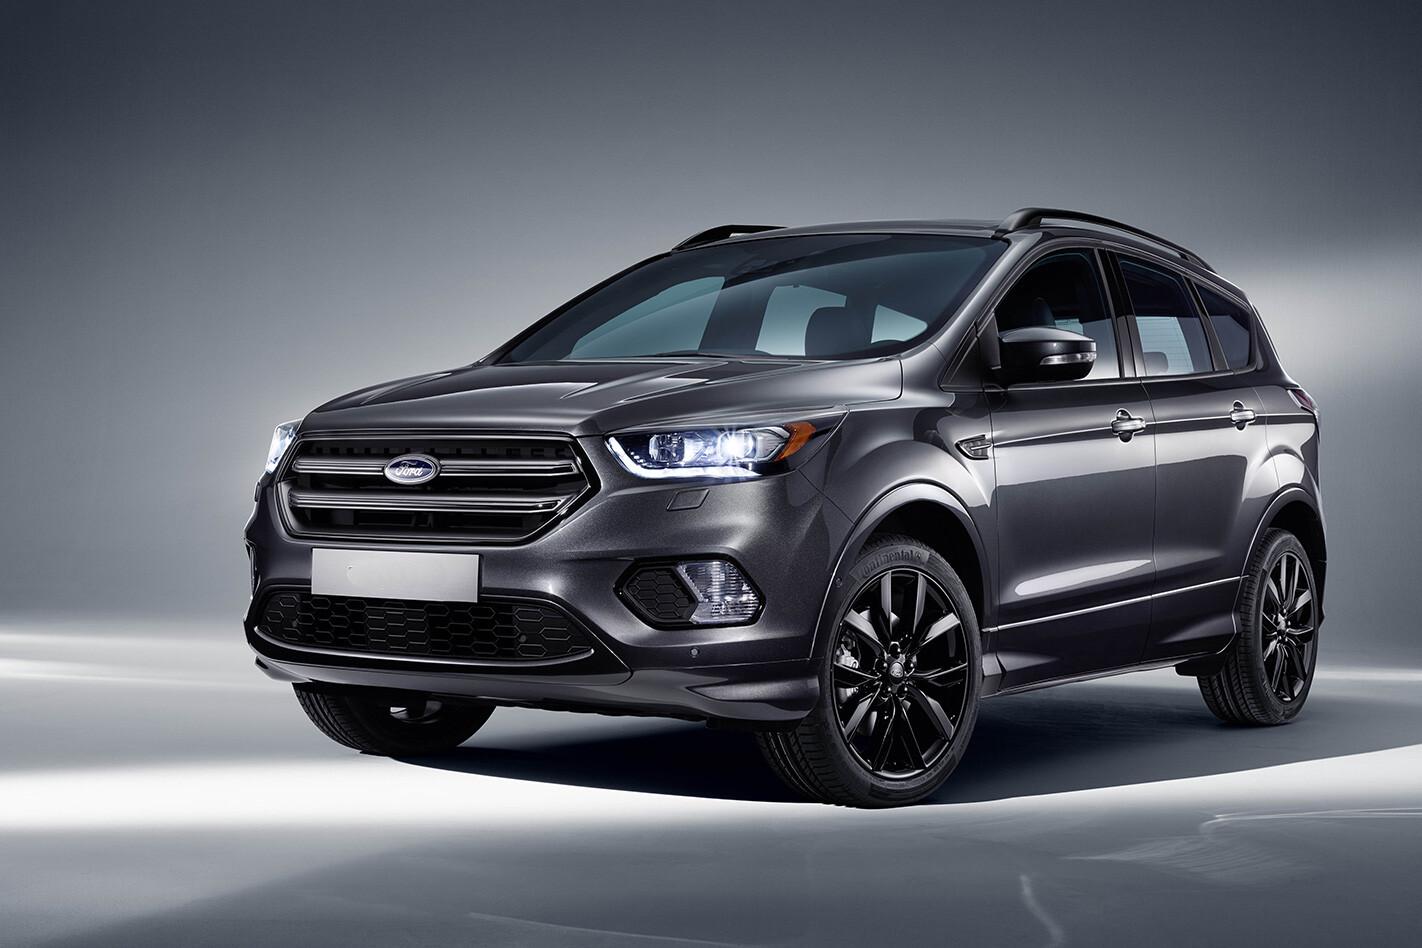 Ford Escape St Line Qtr Jpg